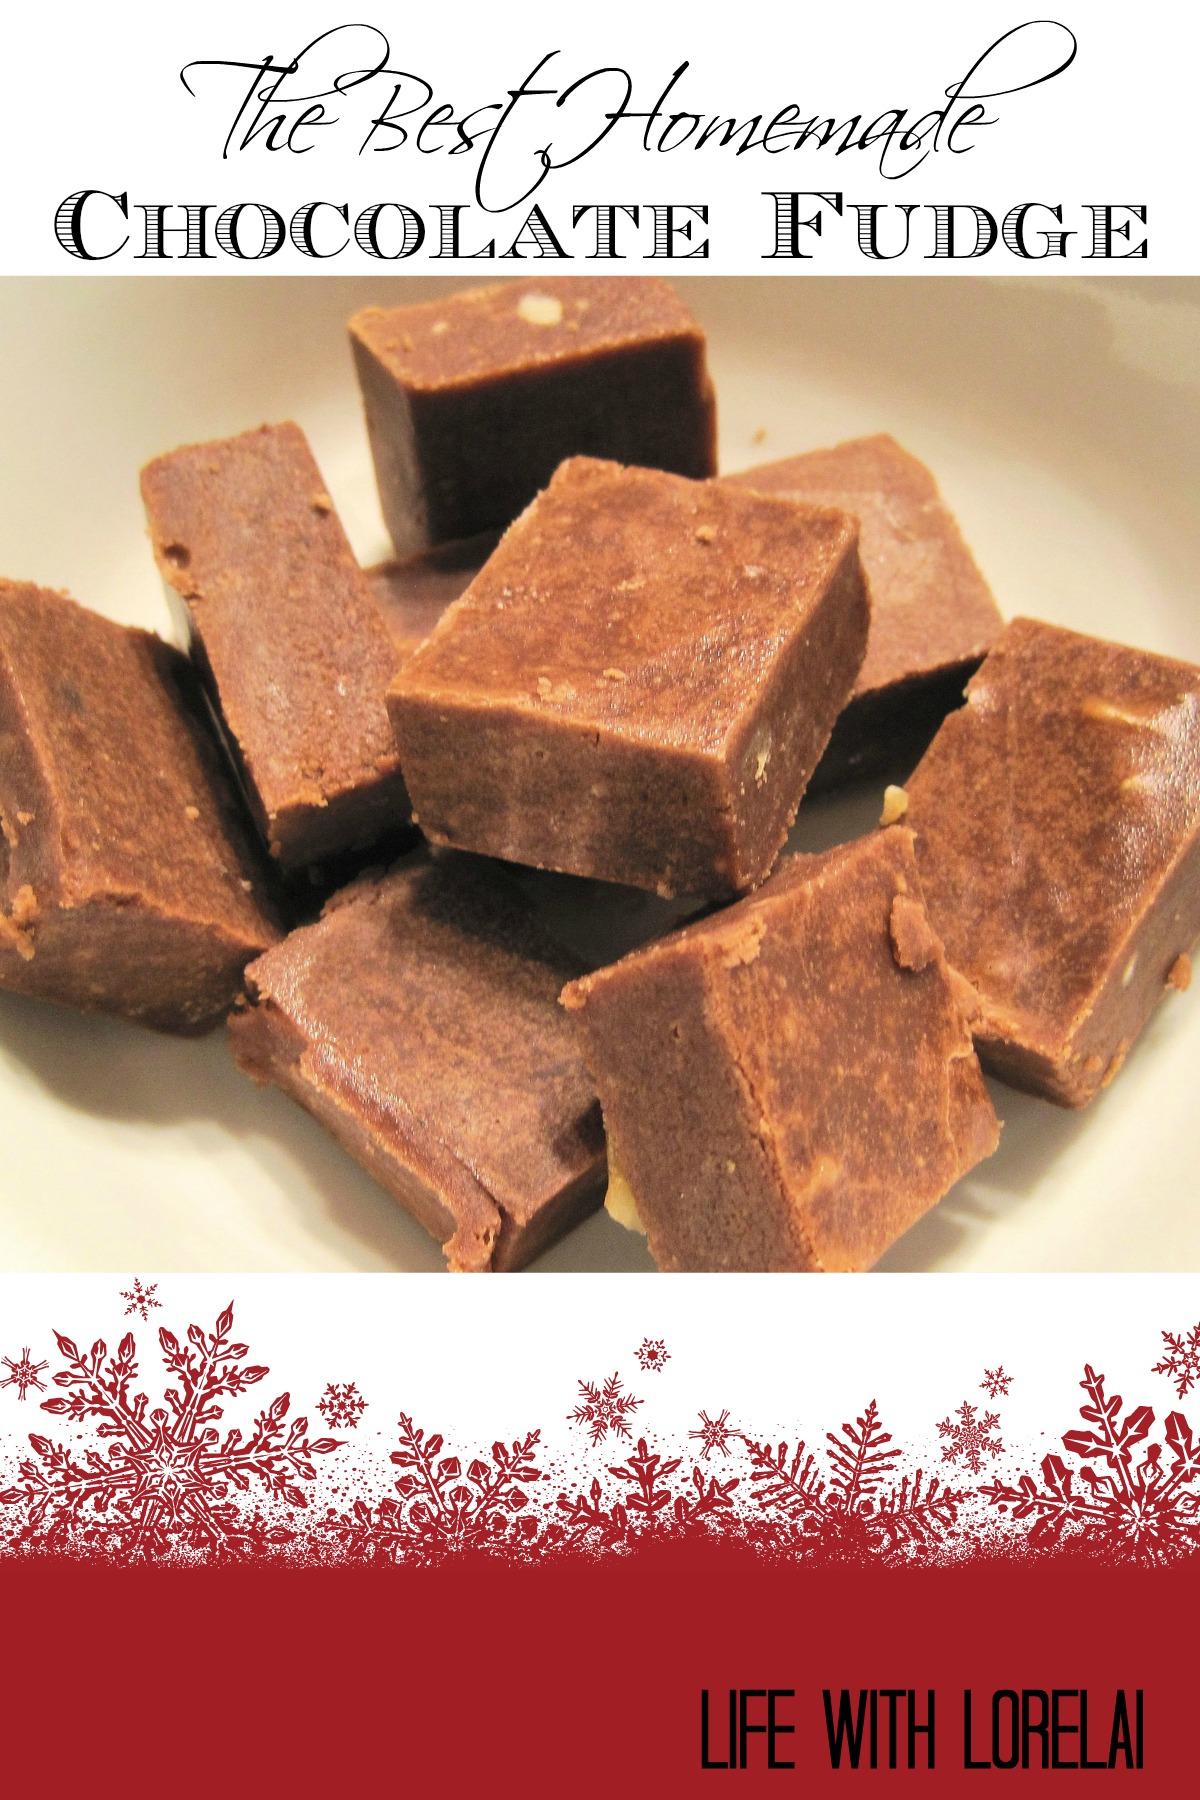 Best-Homemade-Fudge-Recipe - Life-With-Lorelai